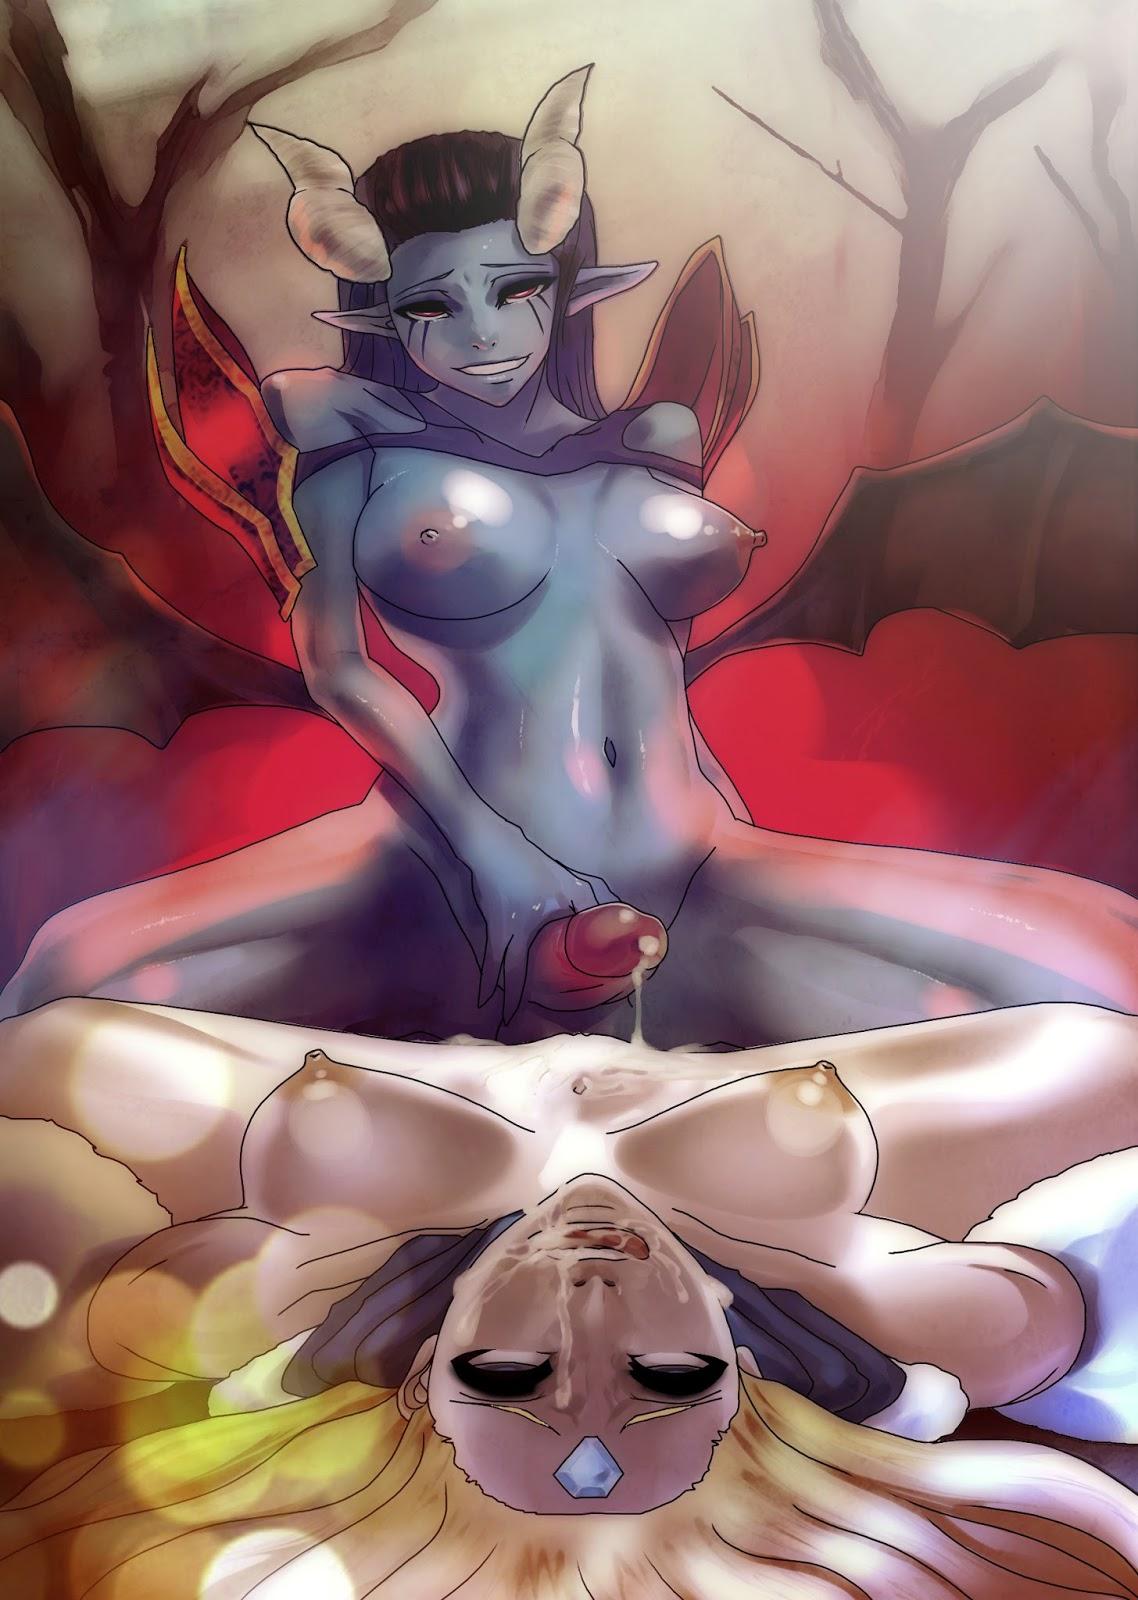 Dota 2 hentai sex video hentia images